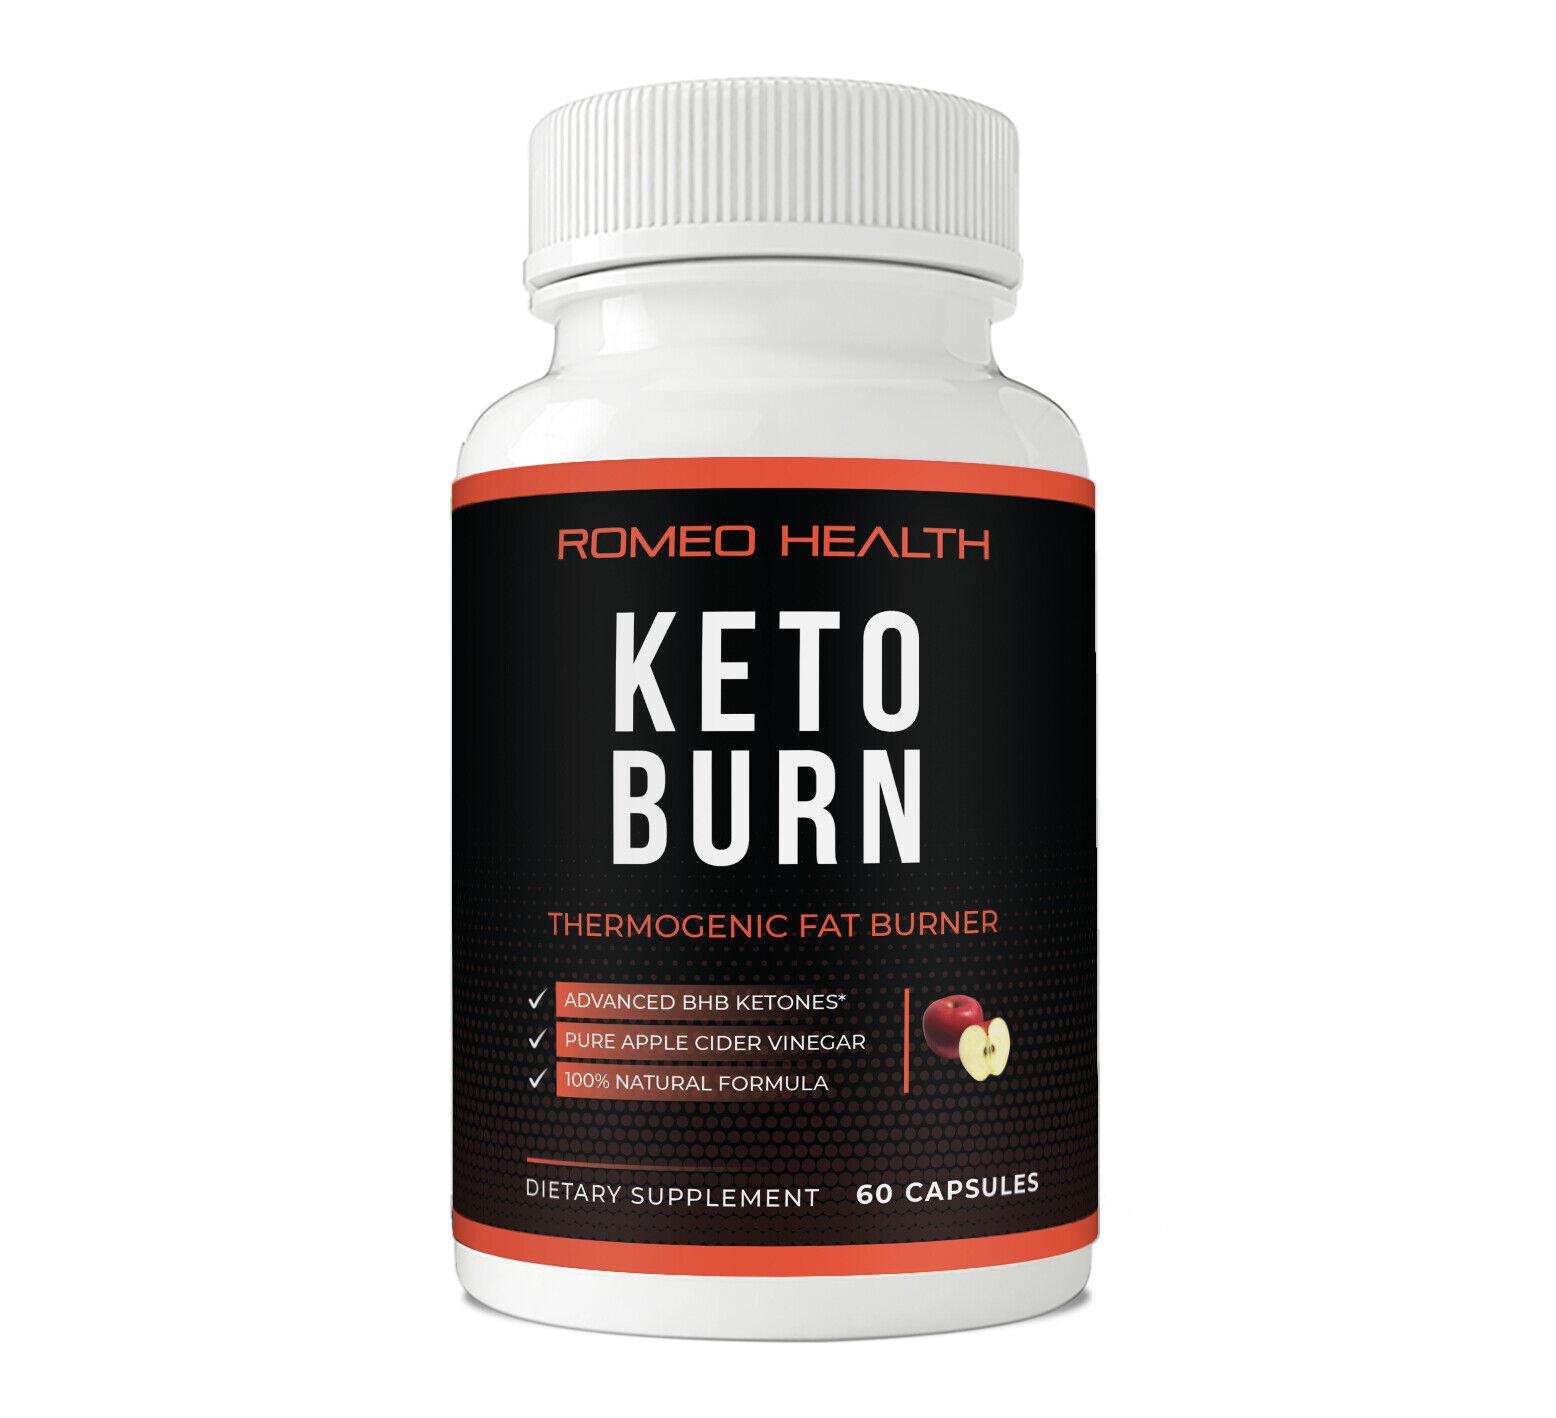 Weight Loss Pills Raspberry Ketone Apple Cider Vinegar Keto Diet Supplement 1